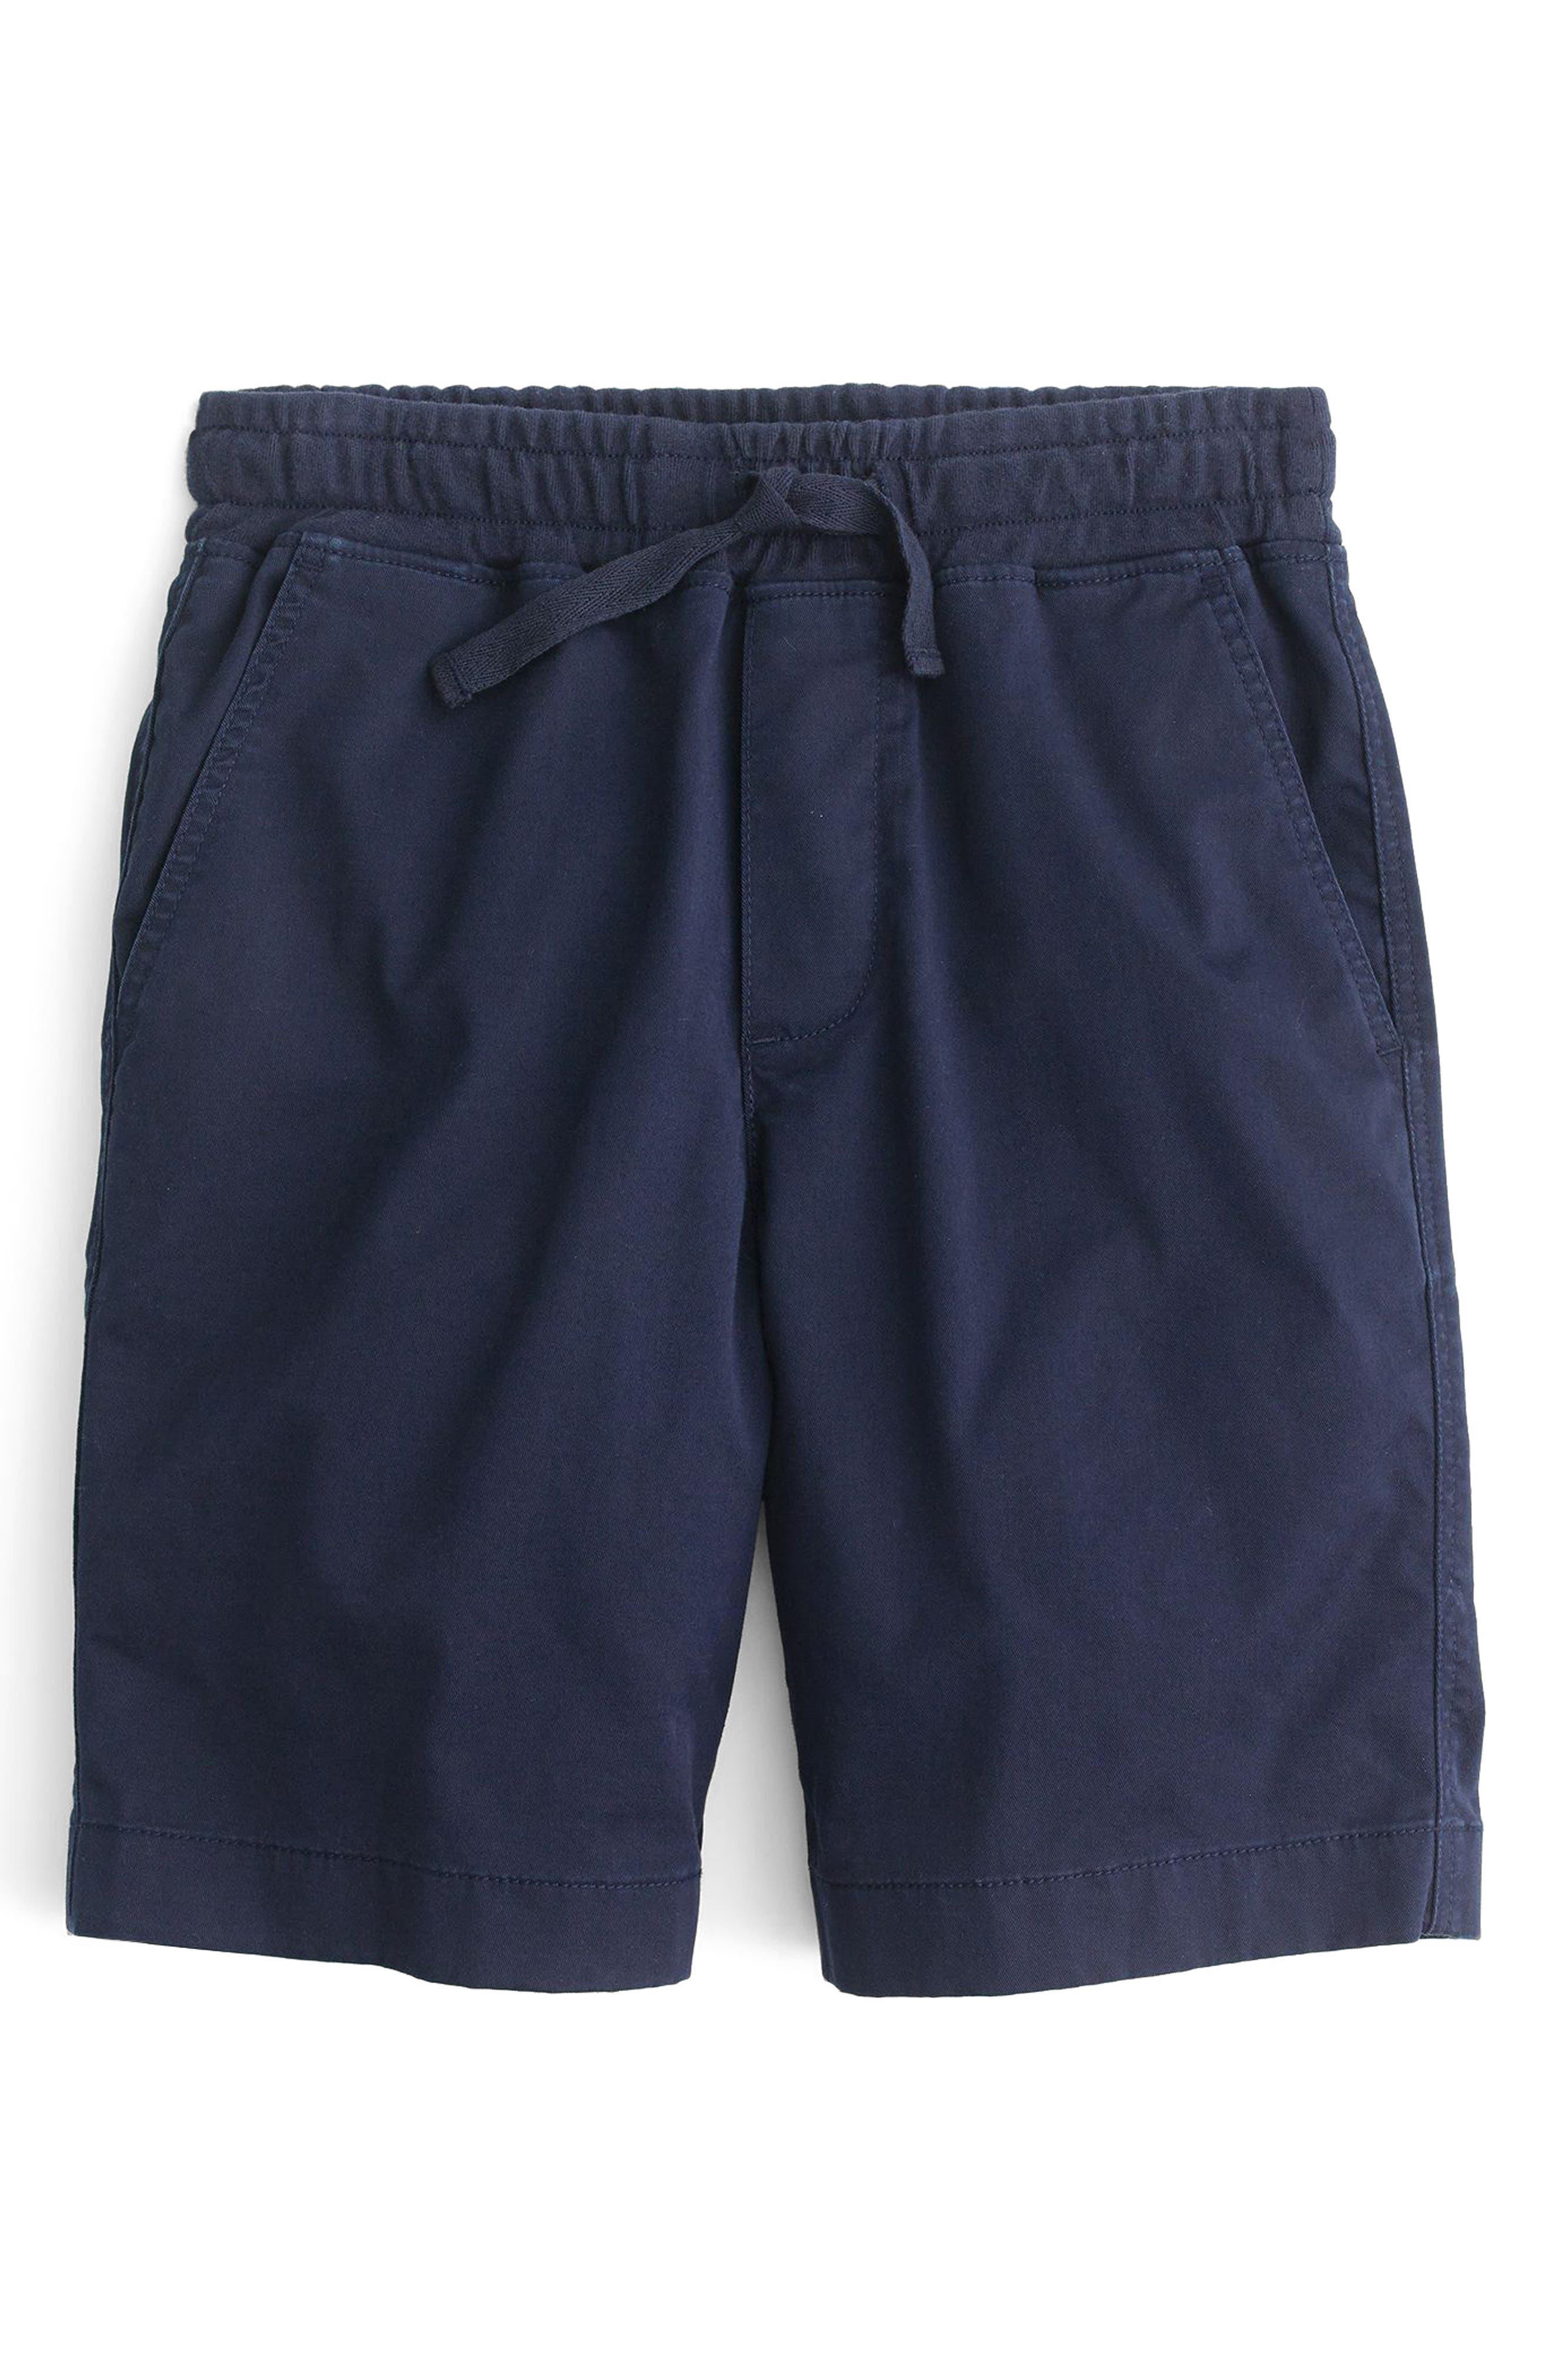 crewcuts by J.Crew Stretch Pull-On Shorts (Toddler Boys, Little Boys & Big Boys)